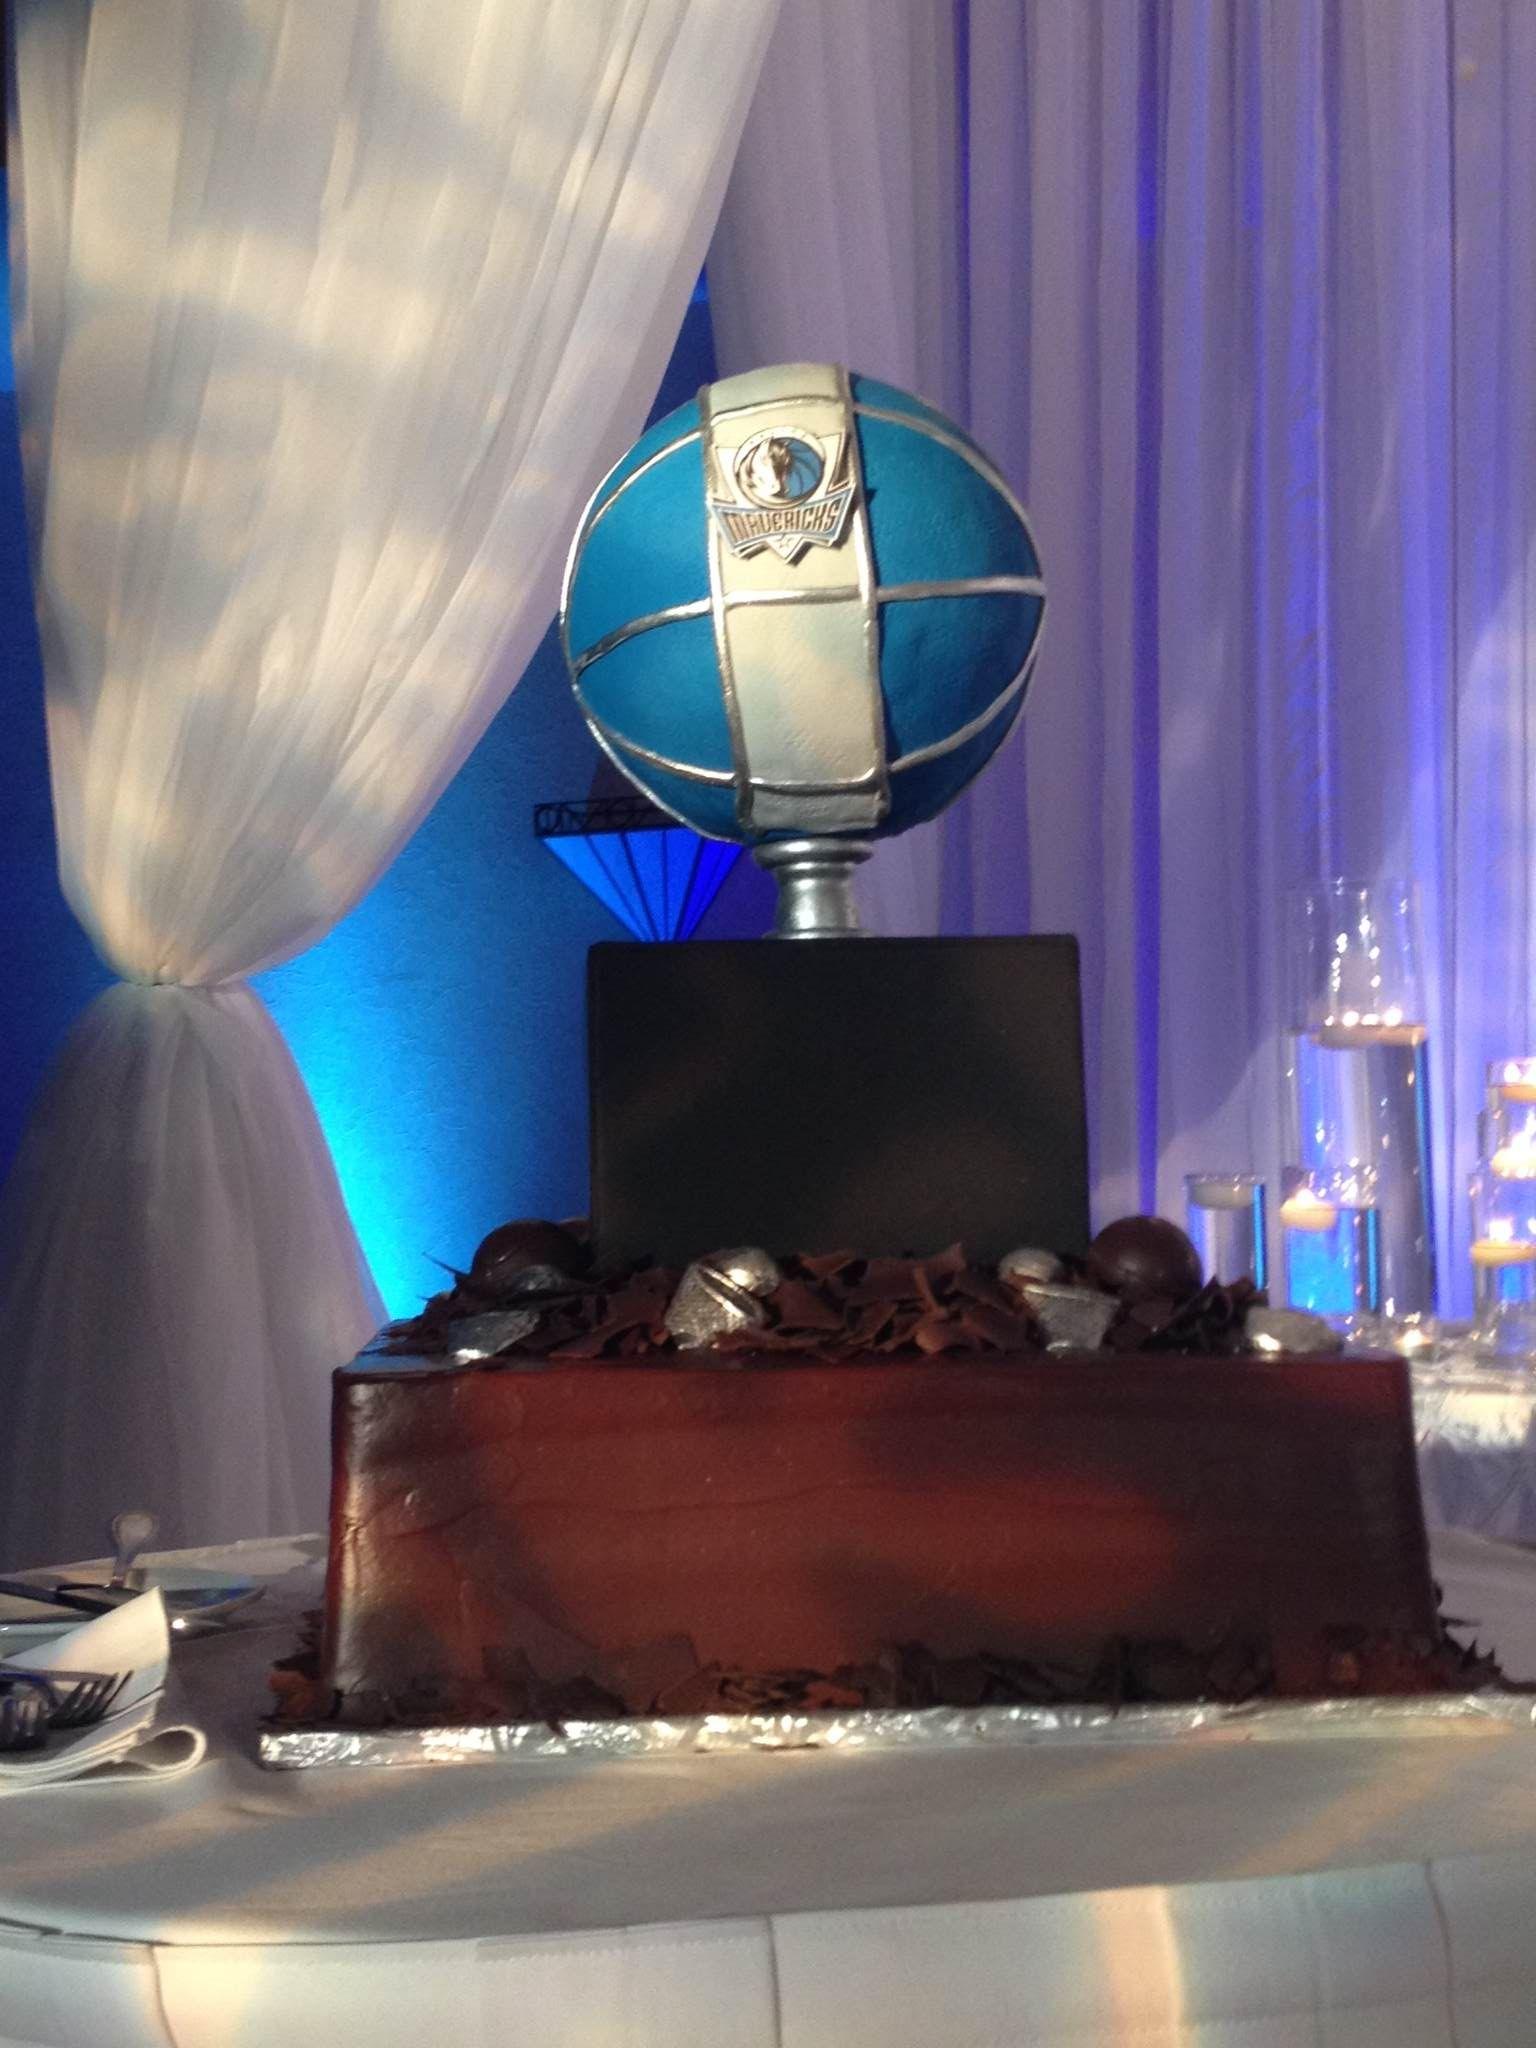 Dallas mavericks cake for groom wedding cake designs